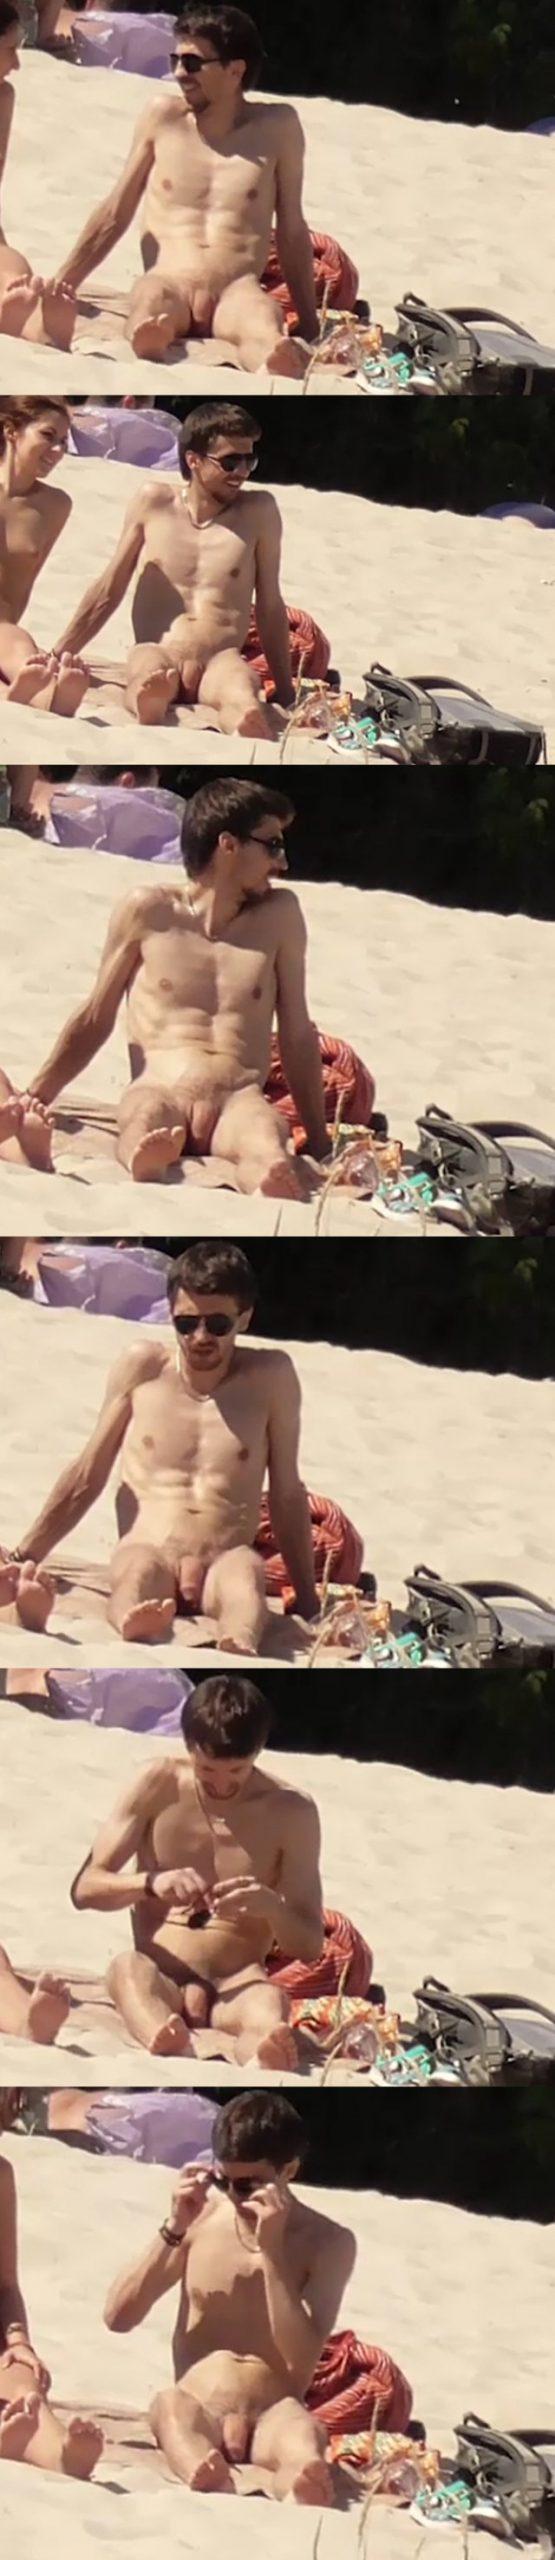 straight nudist guy with huge uncut cock